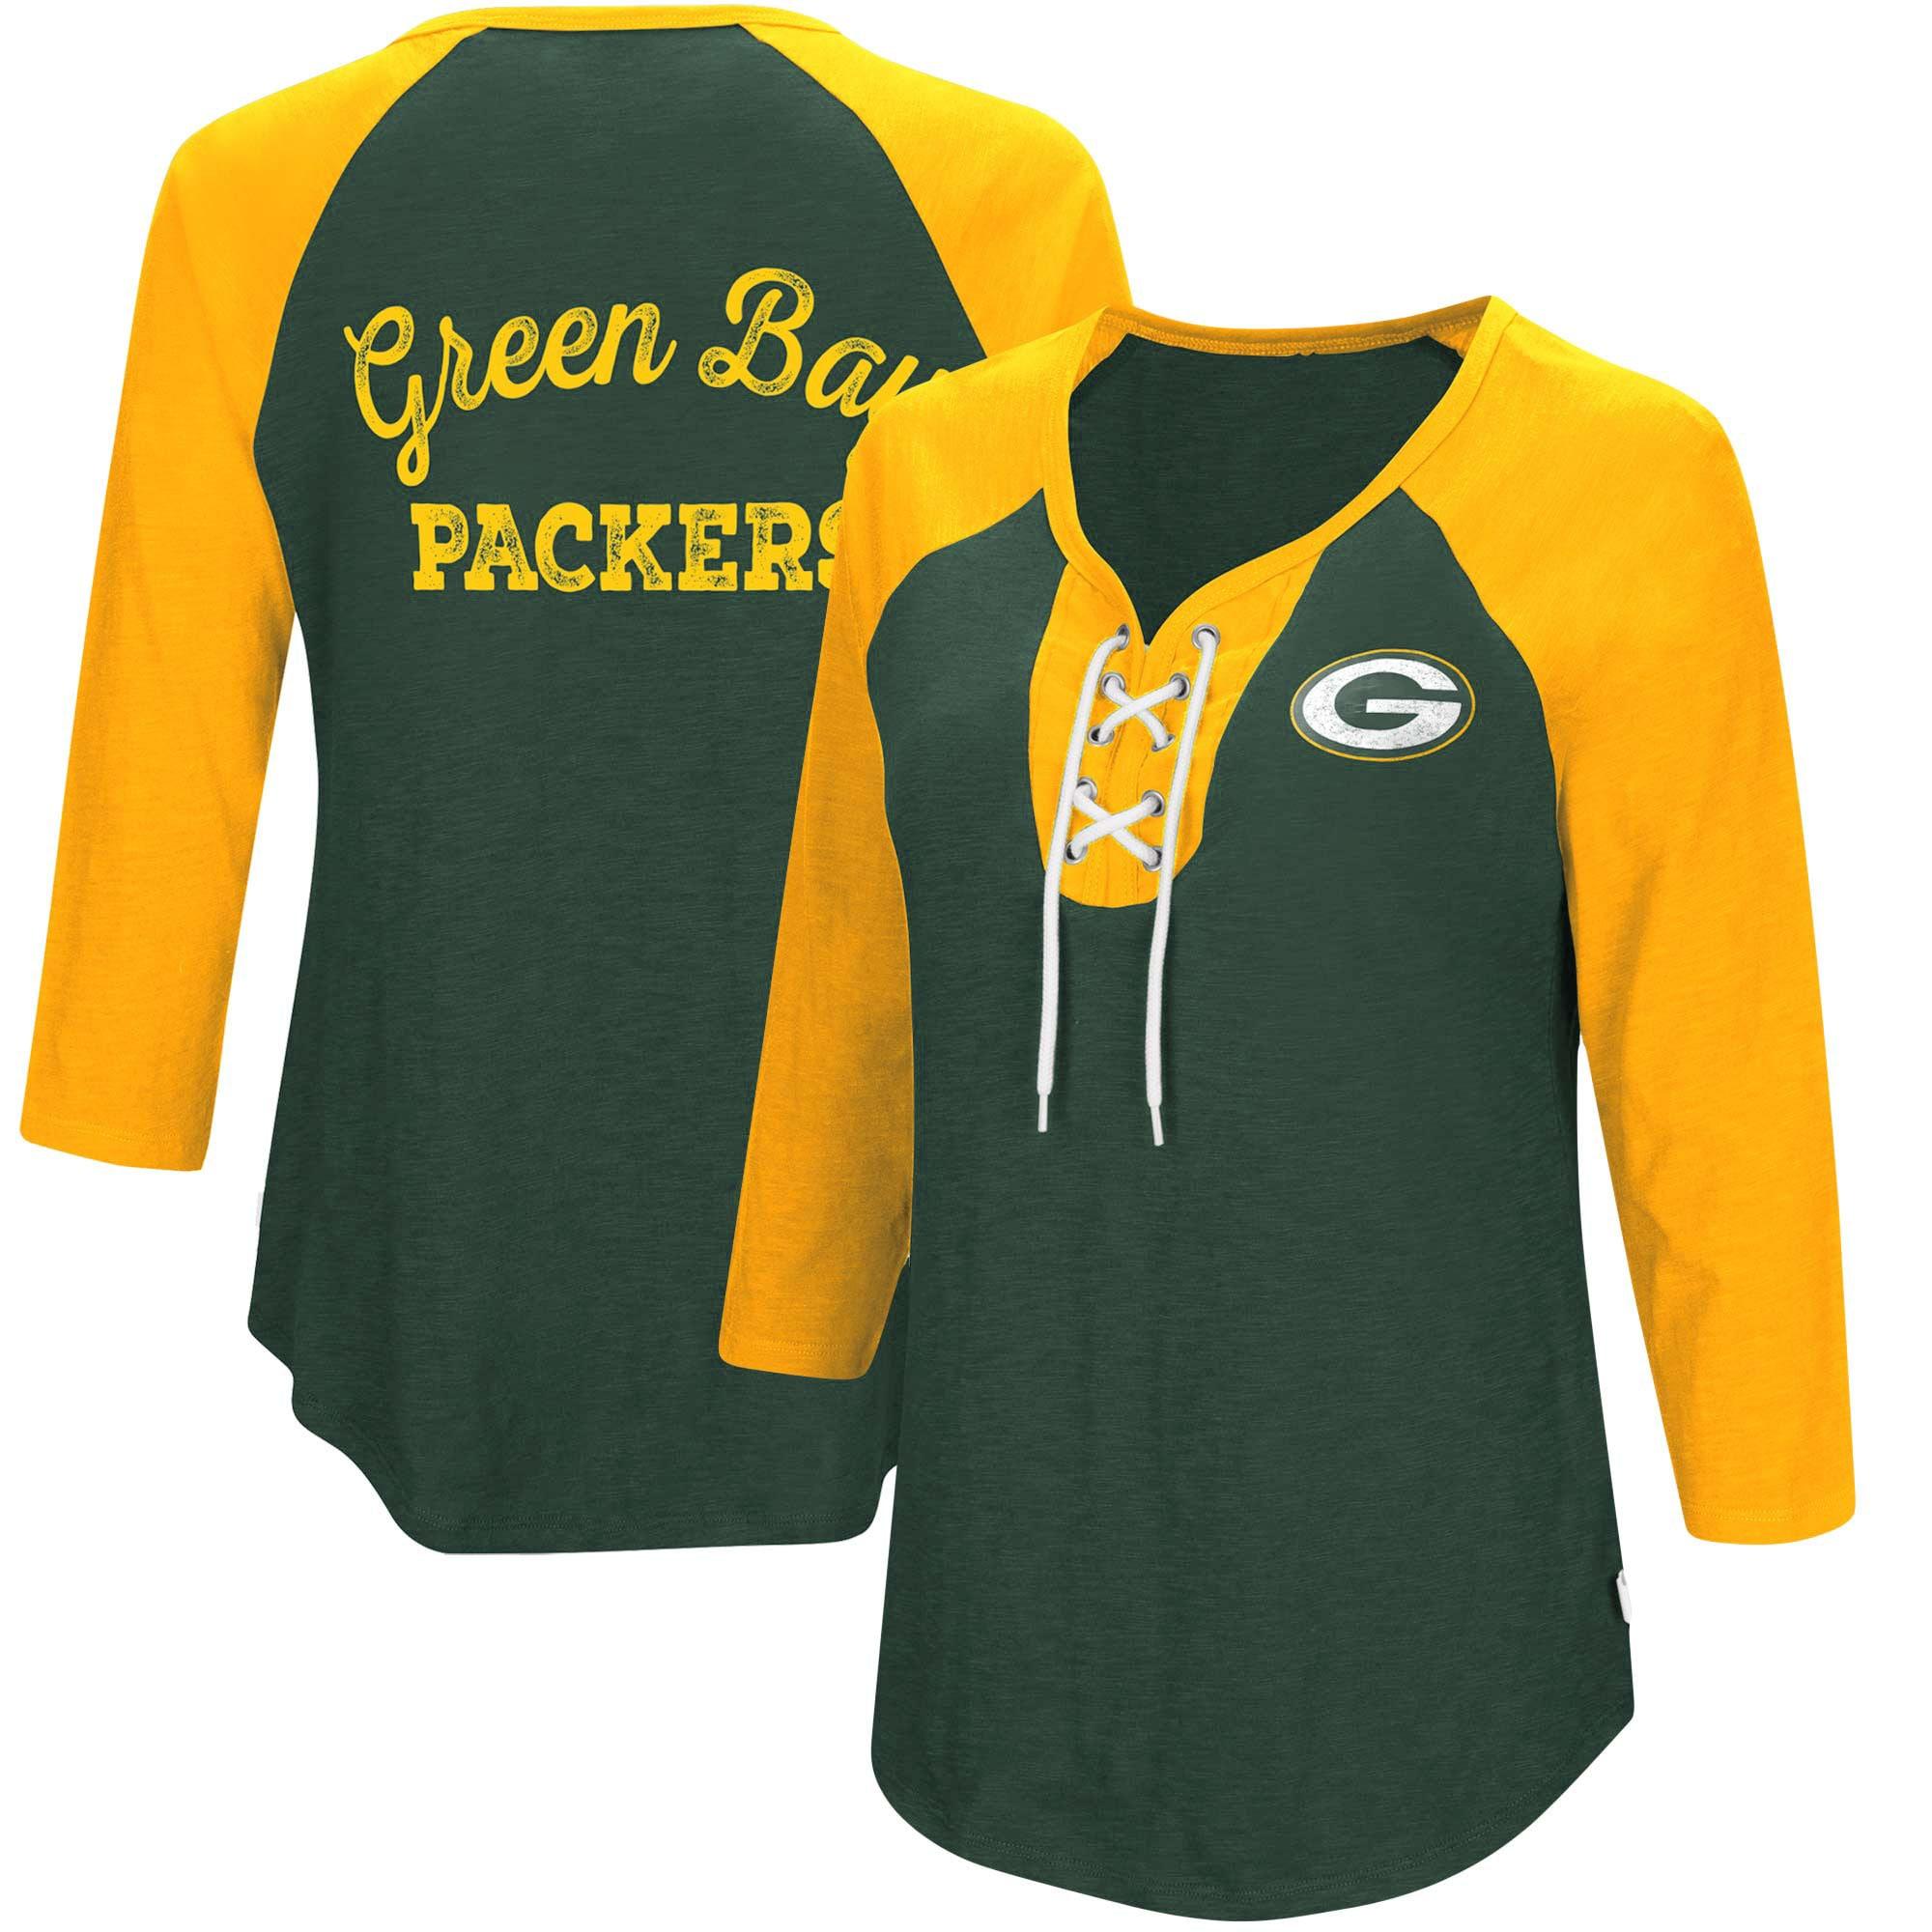 Green Bay Packers Touch by Alyssa Milano Women's Home Run Raglan T-Shirt - Green/Gold